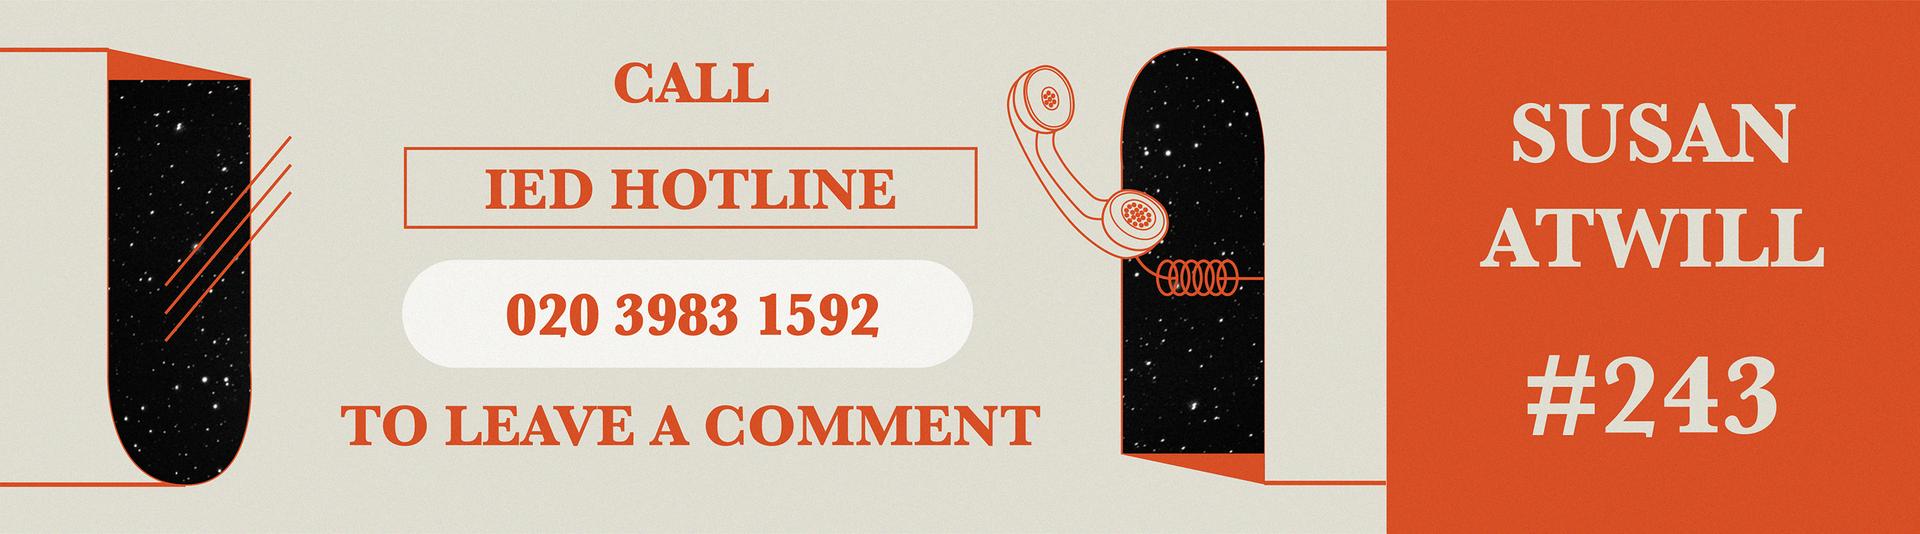 Dial 020 3983 1592